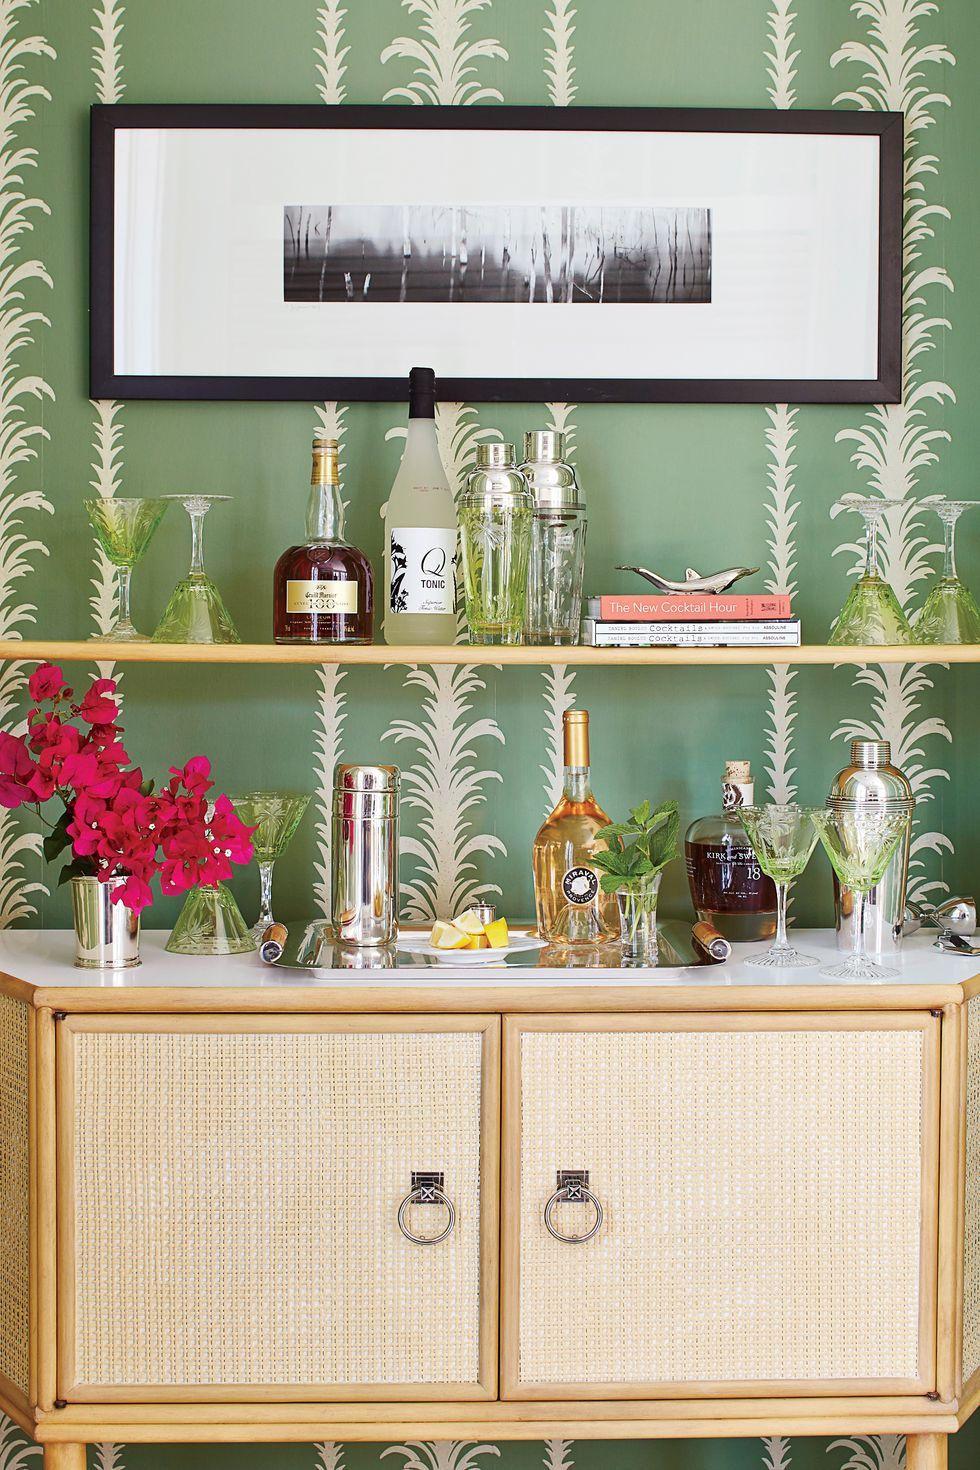 26 BOLD AND STYLISH HOME BAR DESIGN IDEAS